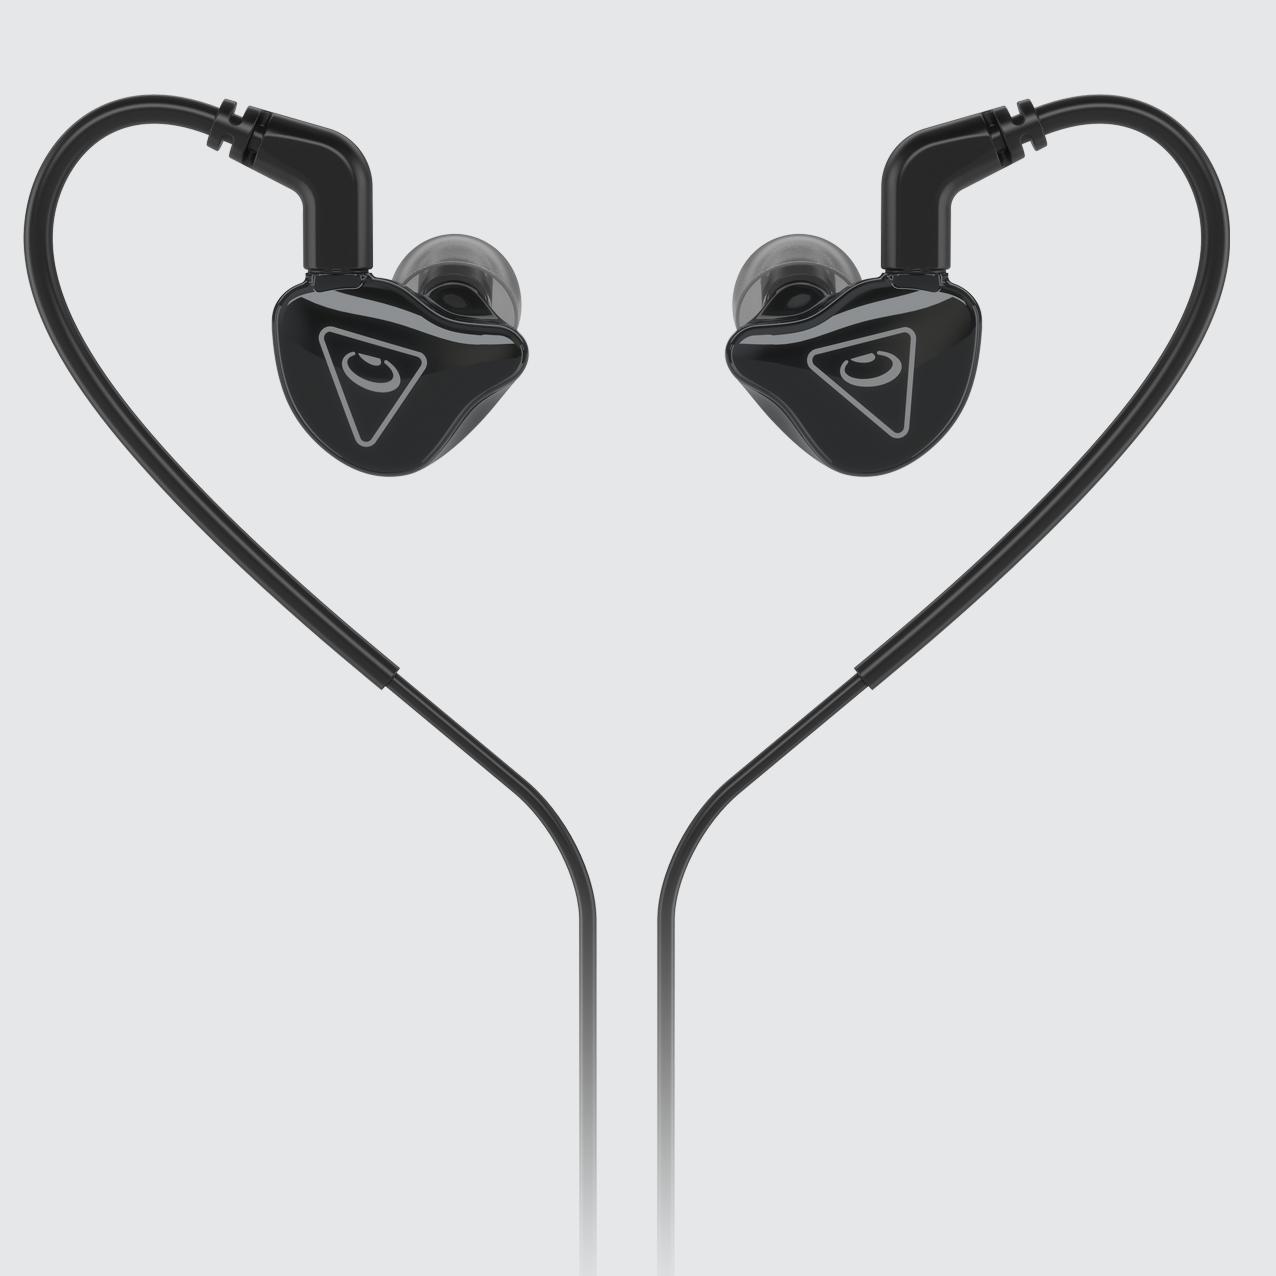 MO240 – Premium In-Ear Studio Monitors for Professionals